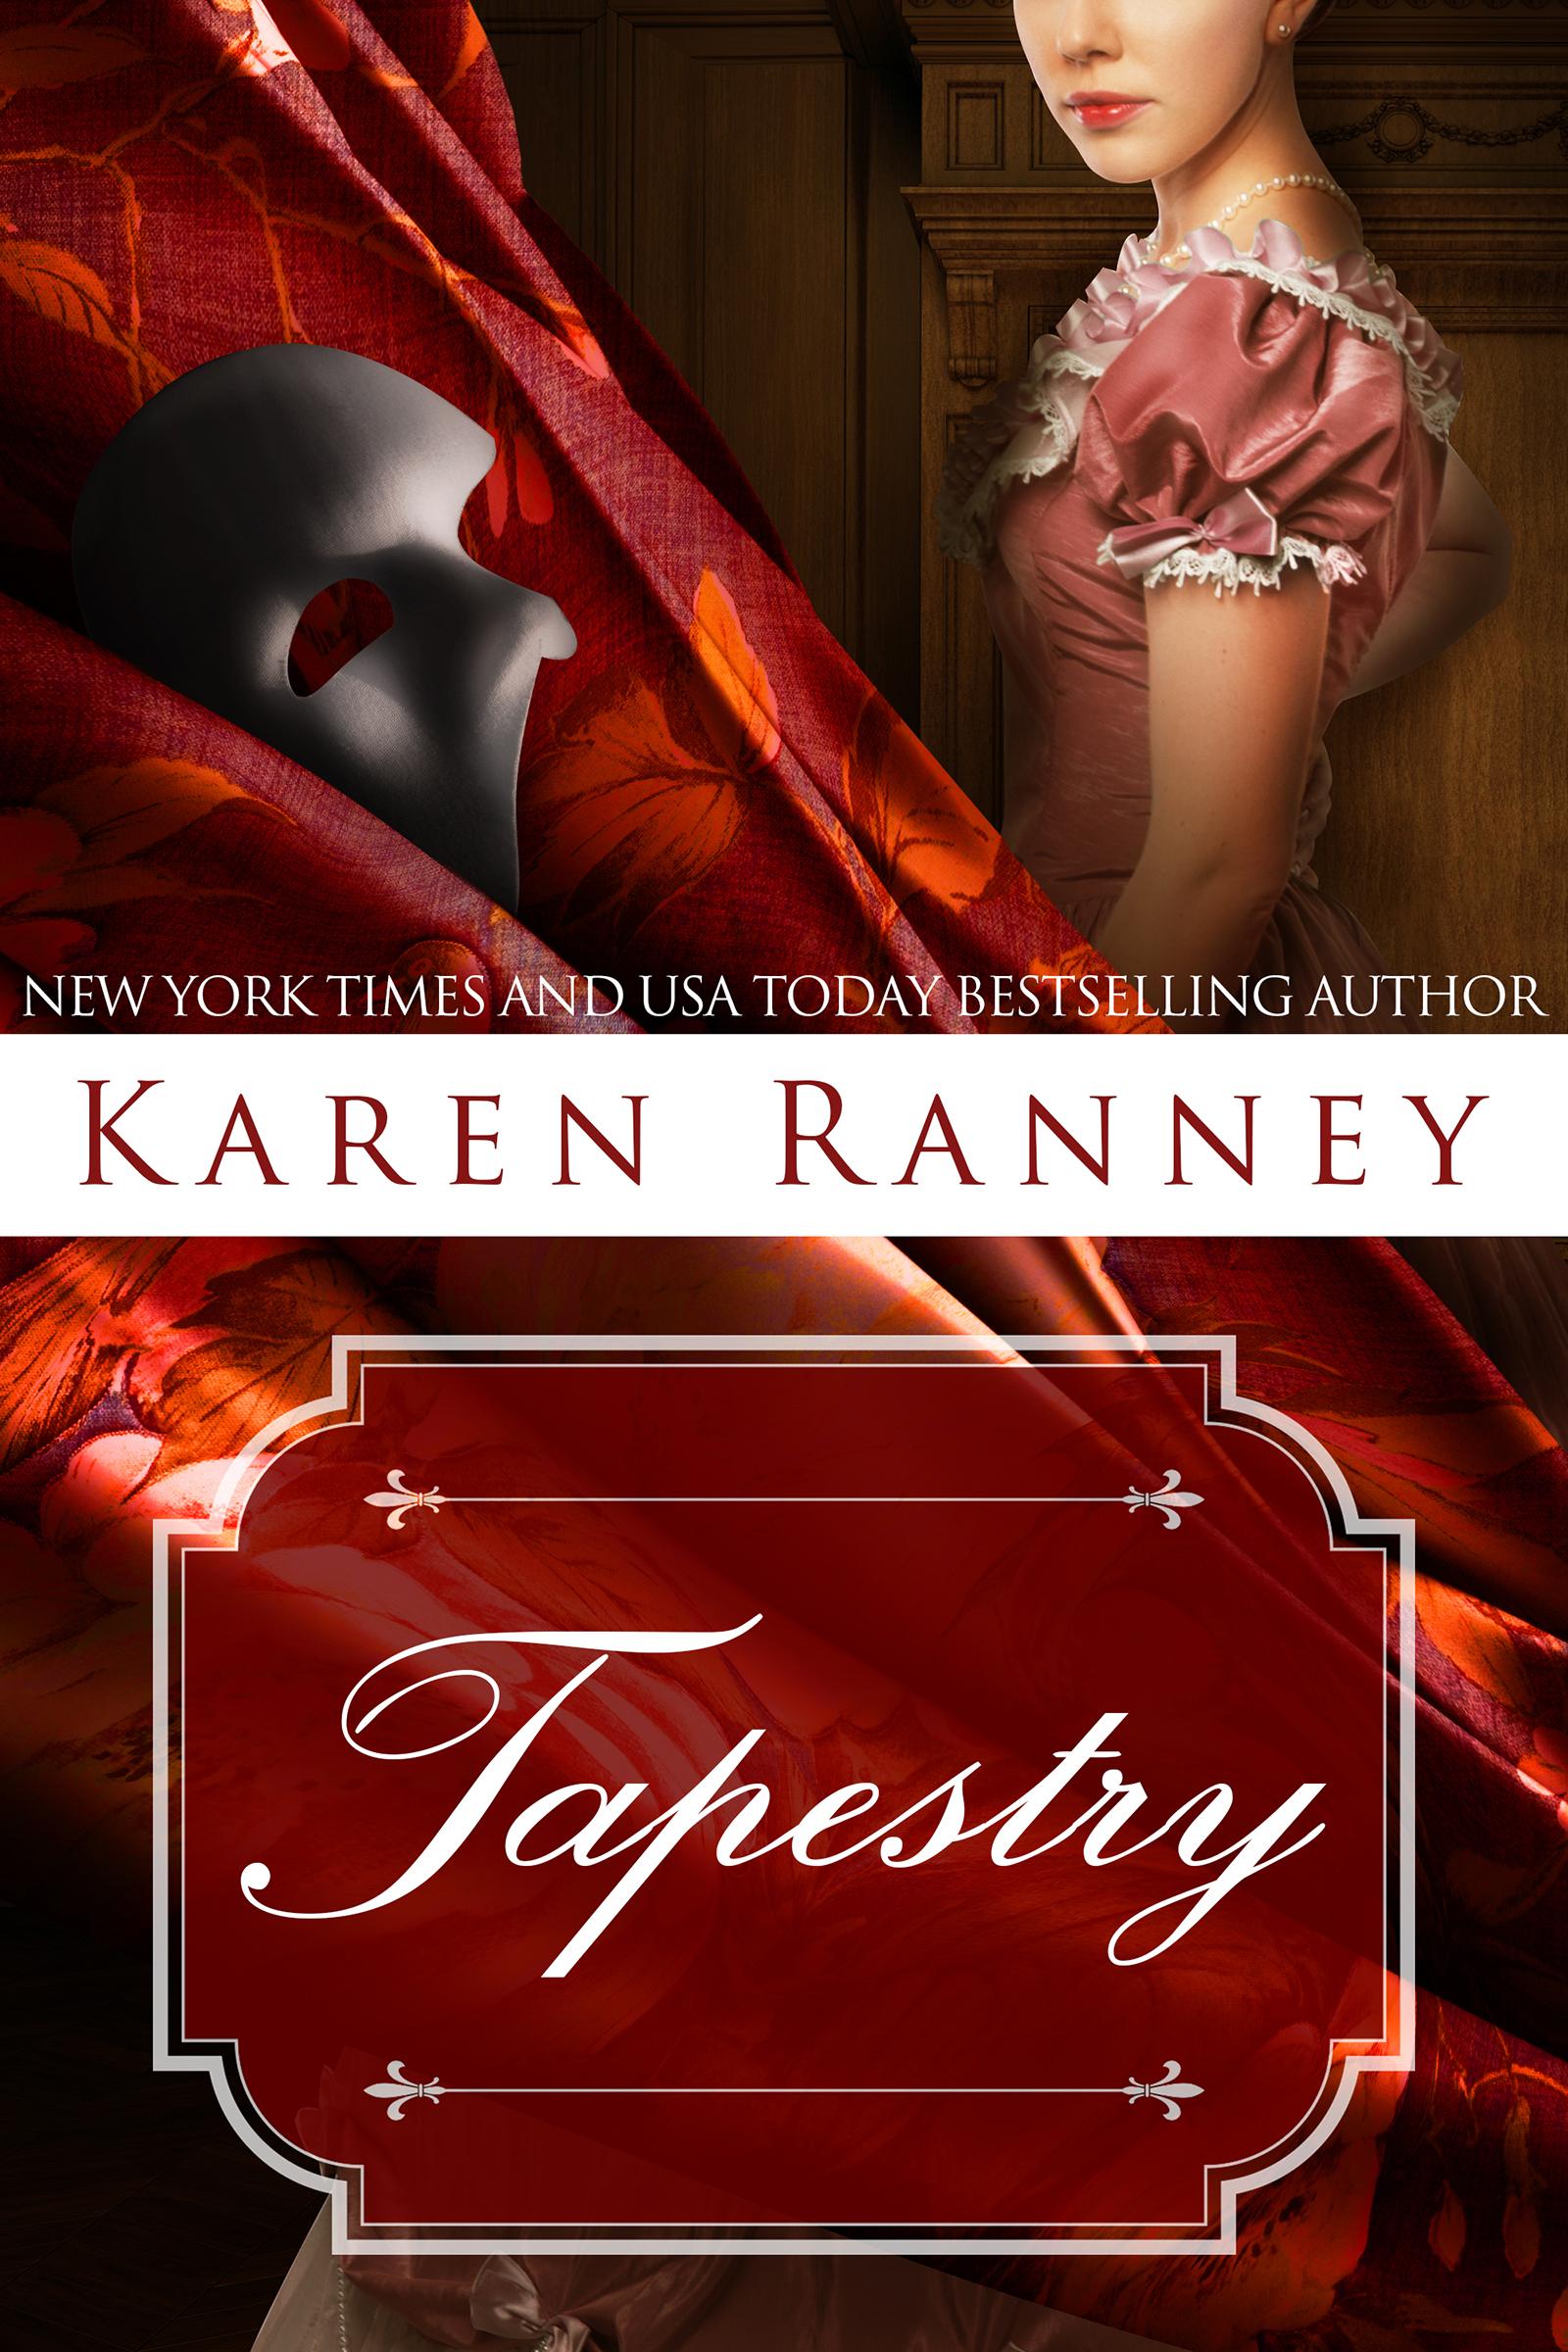 63 Quot Karen Ranney Quot Books Found Quot Tapestry Quot By Karen Ranney border=